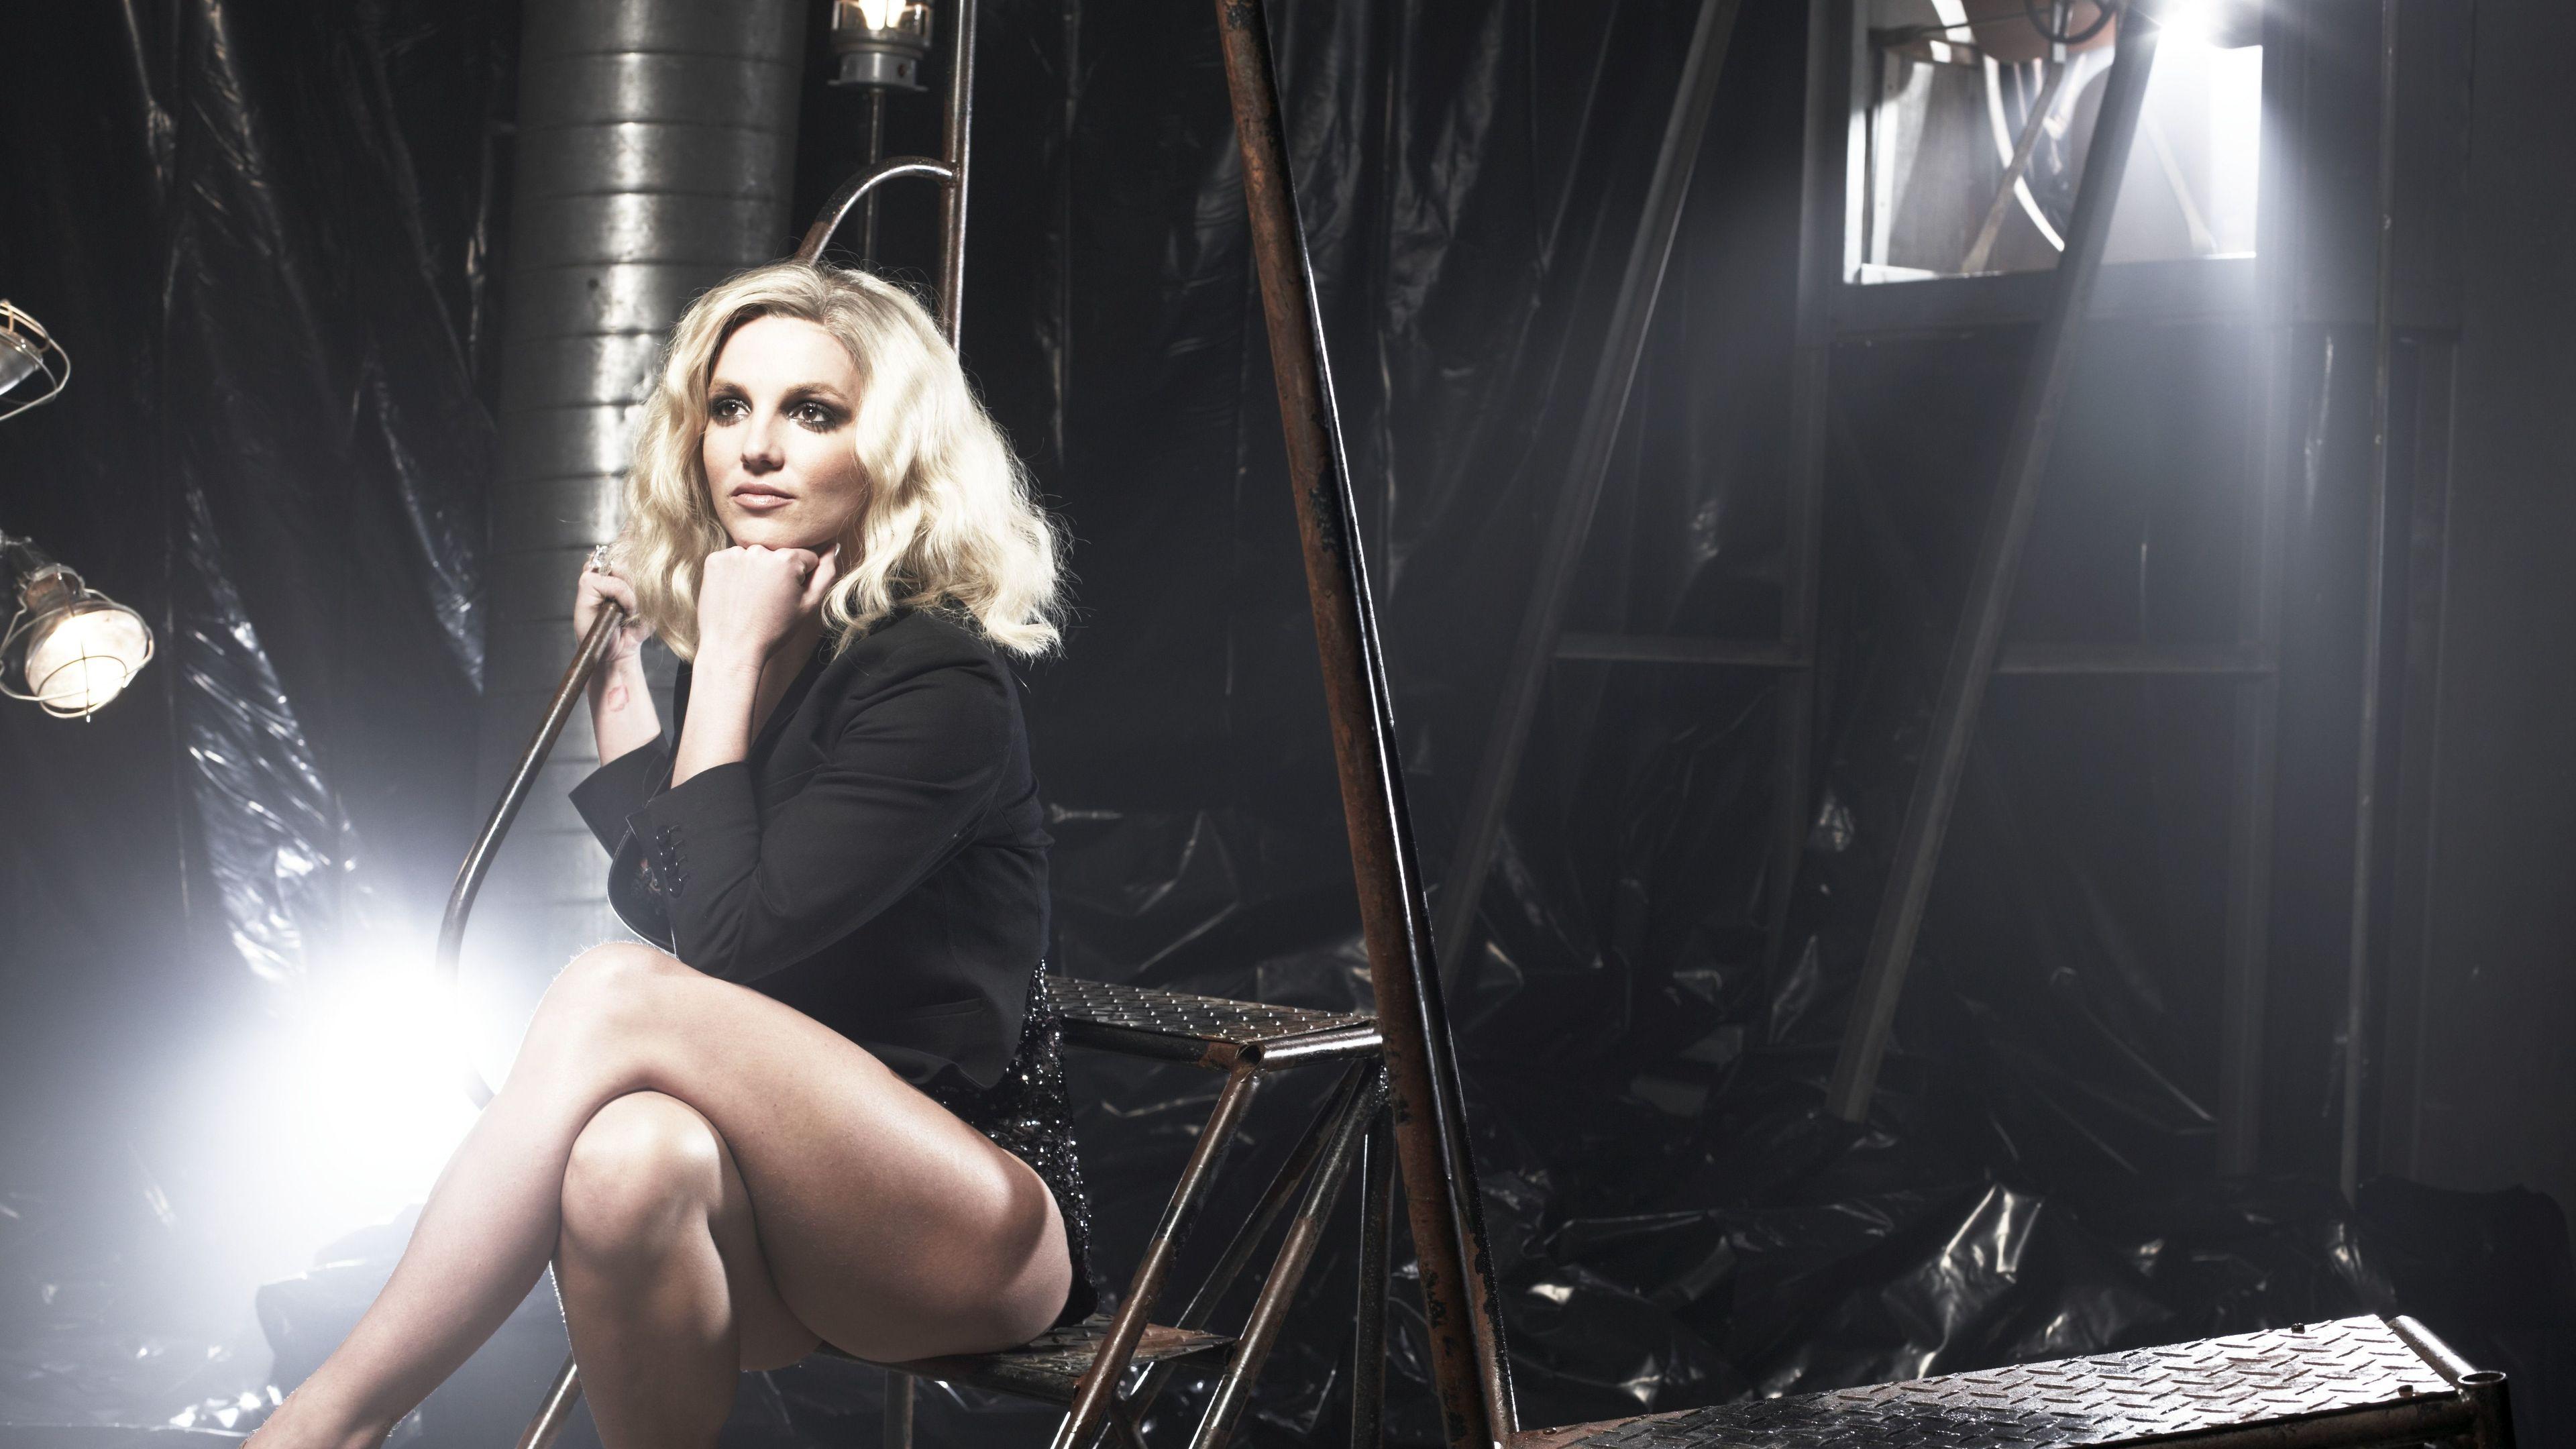 britney spears 5k 2019 1536951899 - Britney Spears 5k 2019 - music wallpapers, hd-wallpapers, girls wallpapers, celebrities wallpapers, britney spears wallpapers, 5k wallpapers, 4k-wallpapers